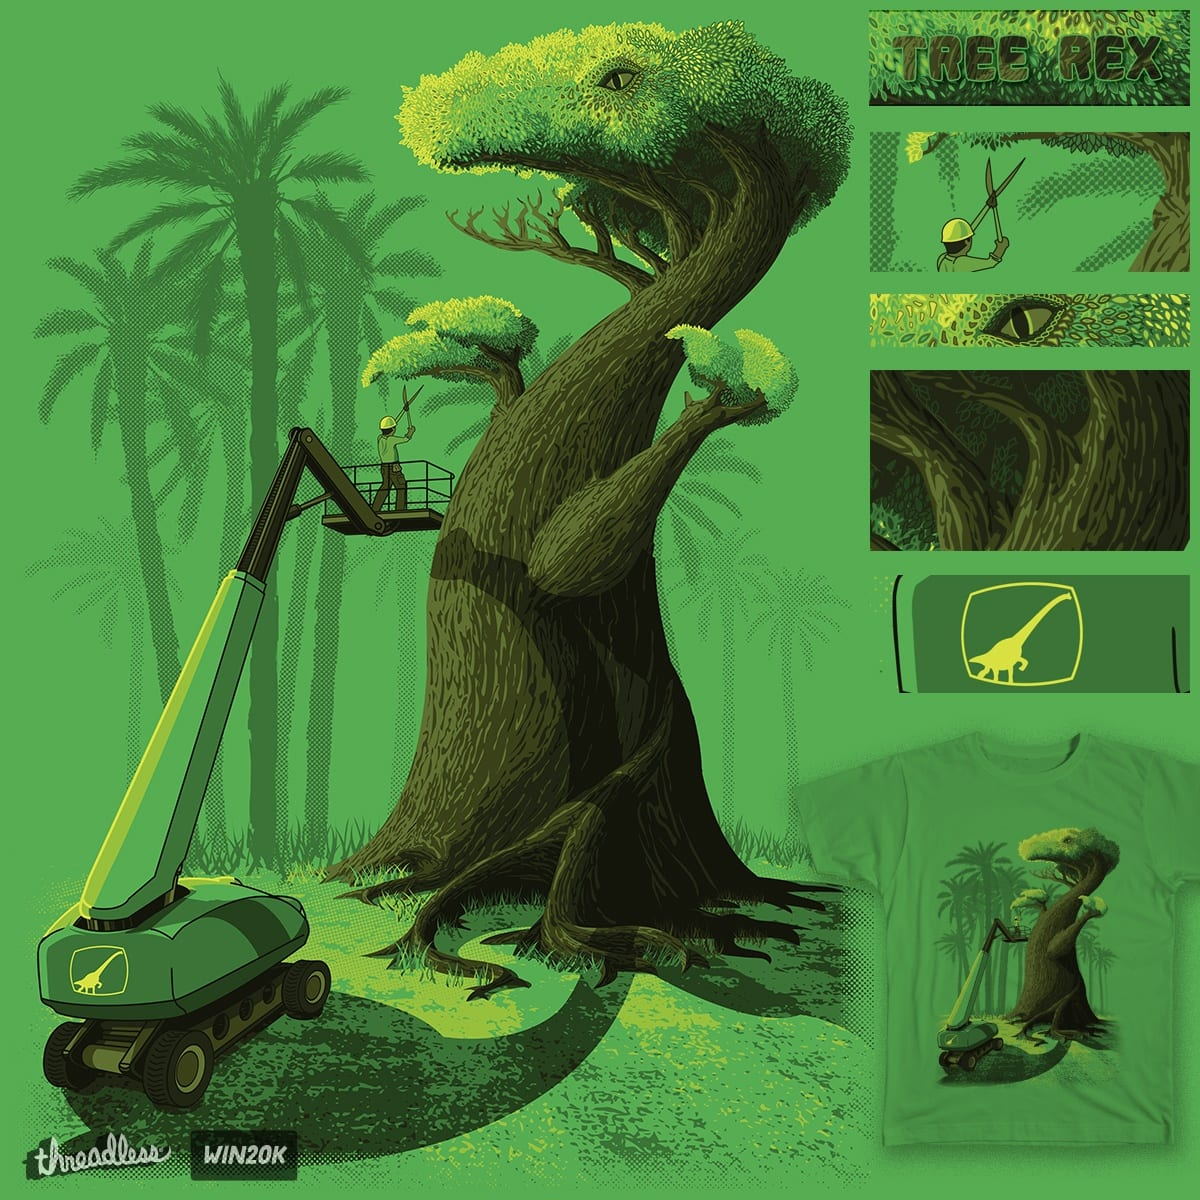 Tree Rex by Neight-Bit on Threadless